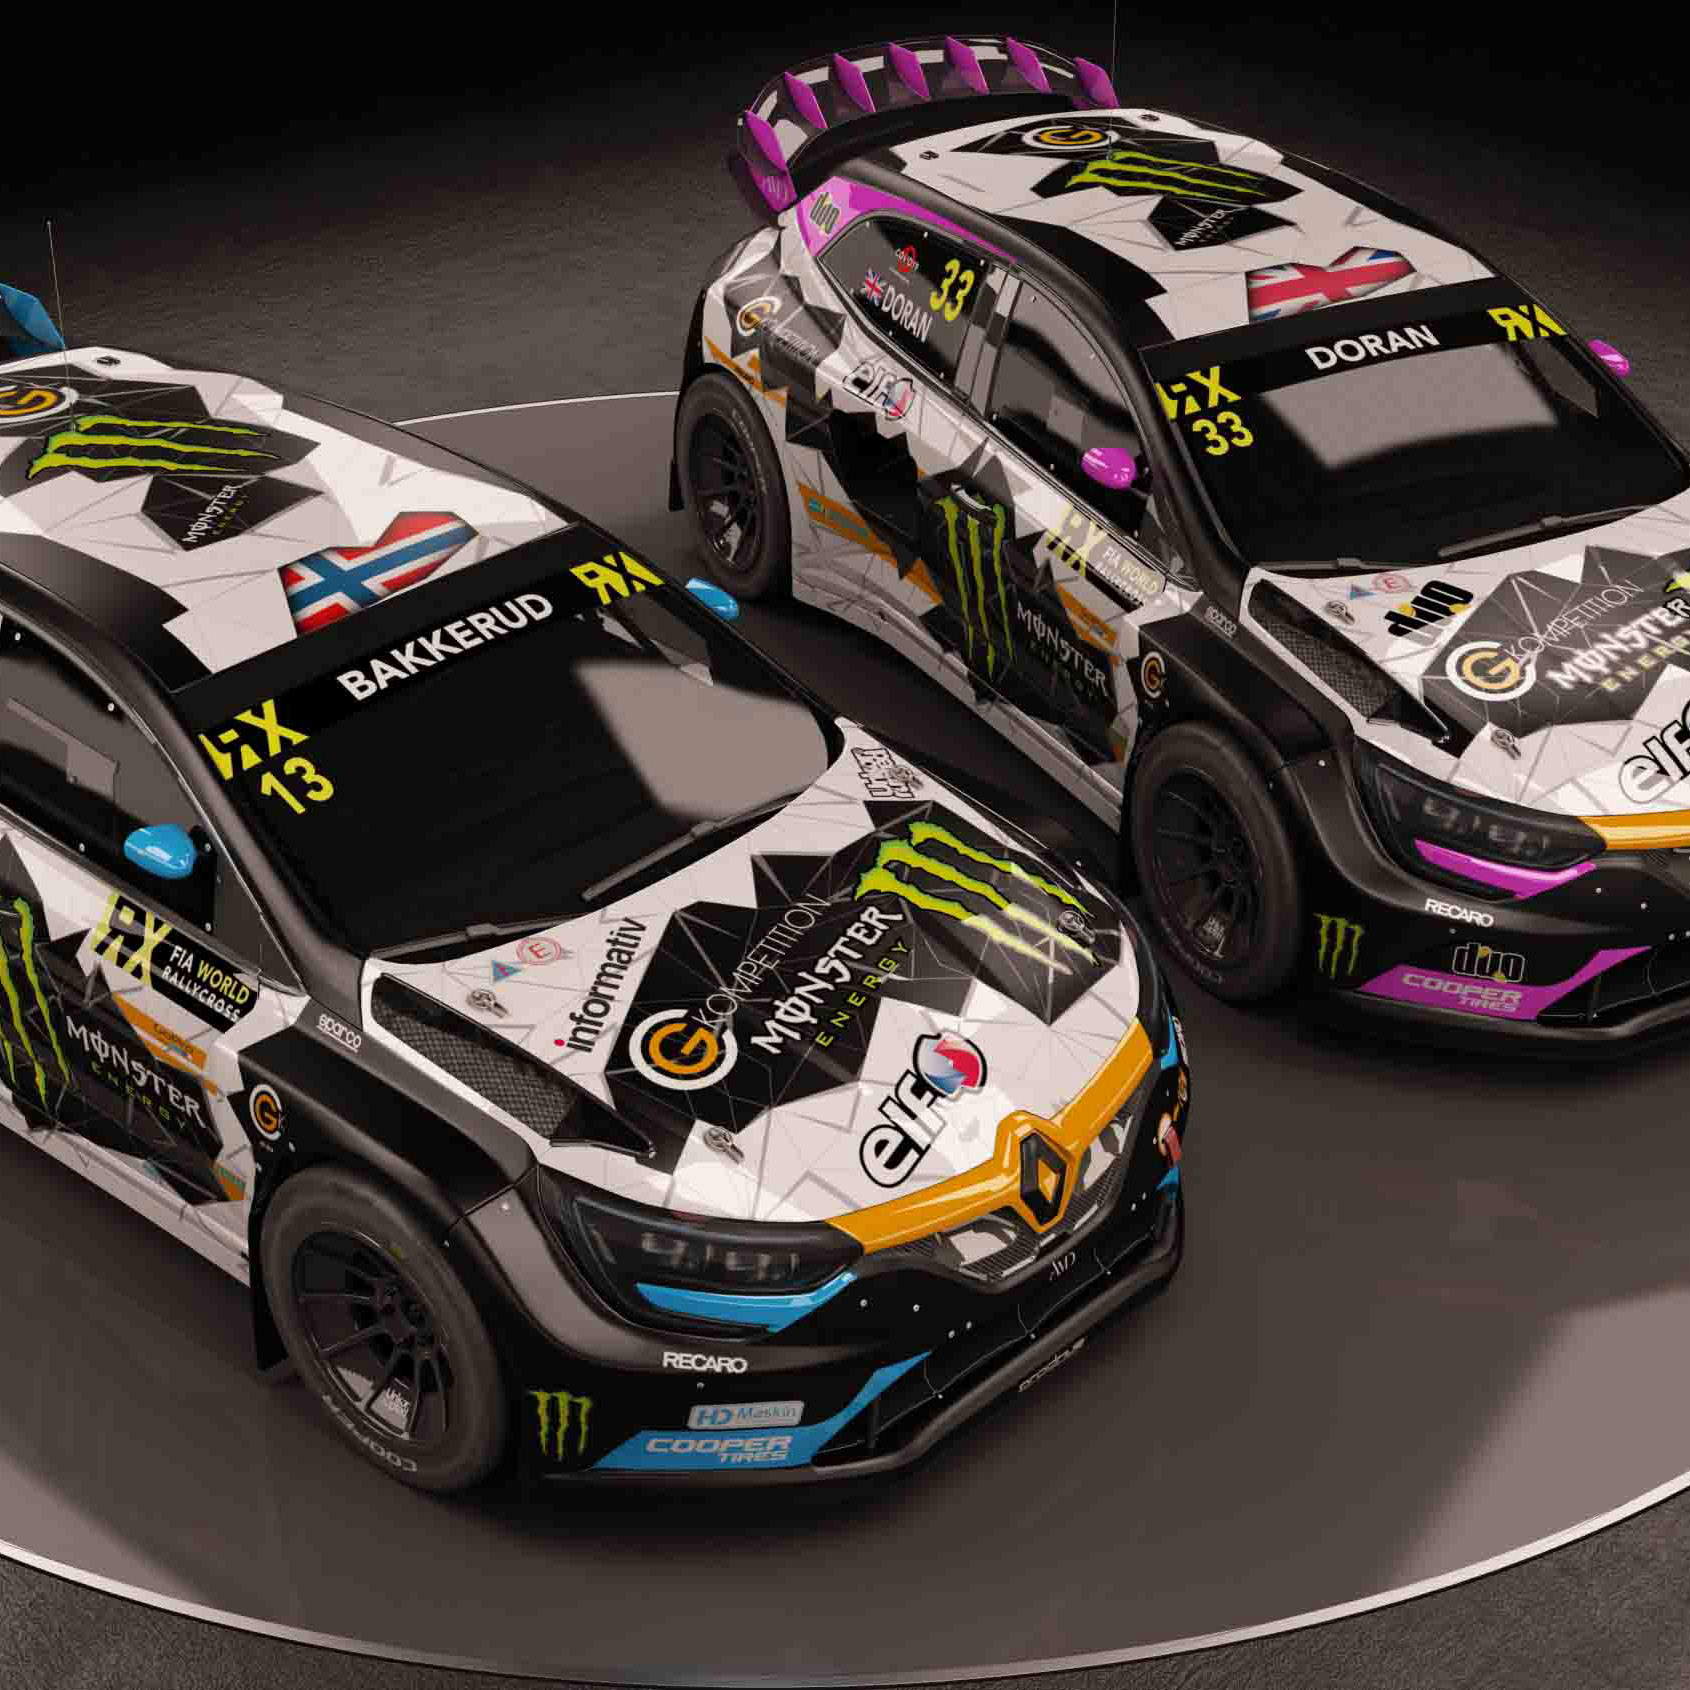 Renault Megane FIA World Rallycross AMD 06 a